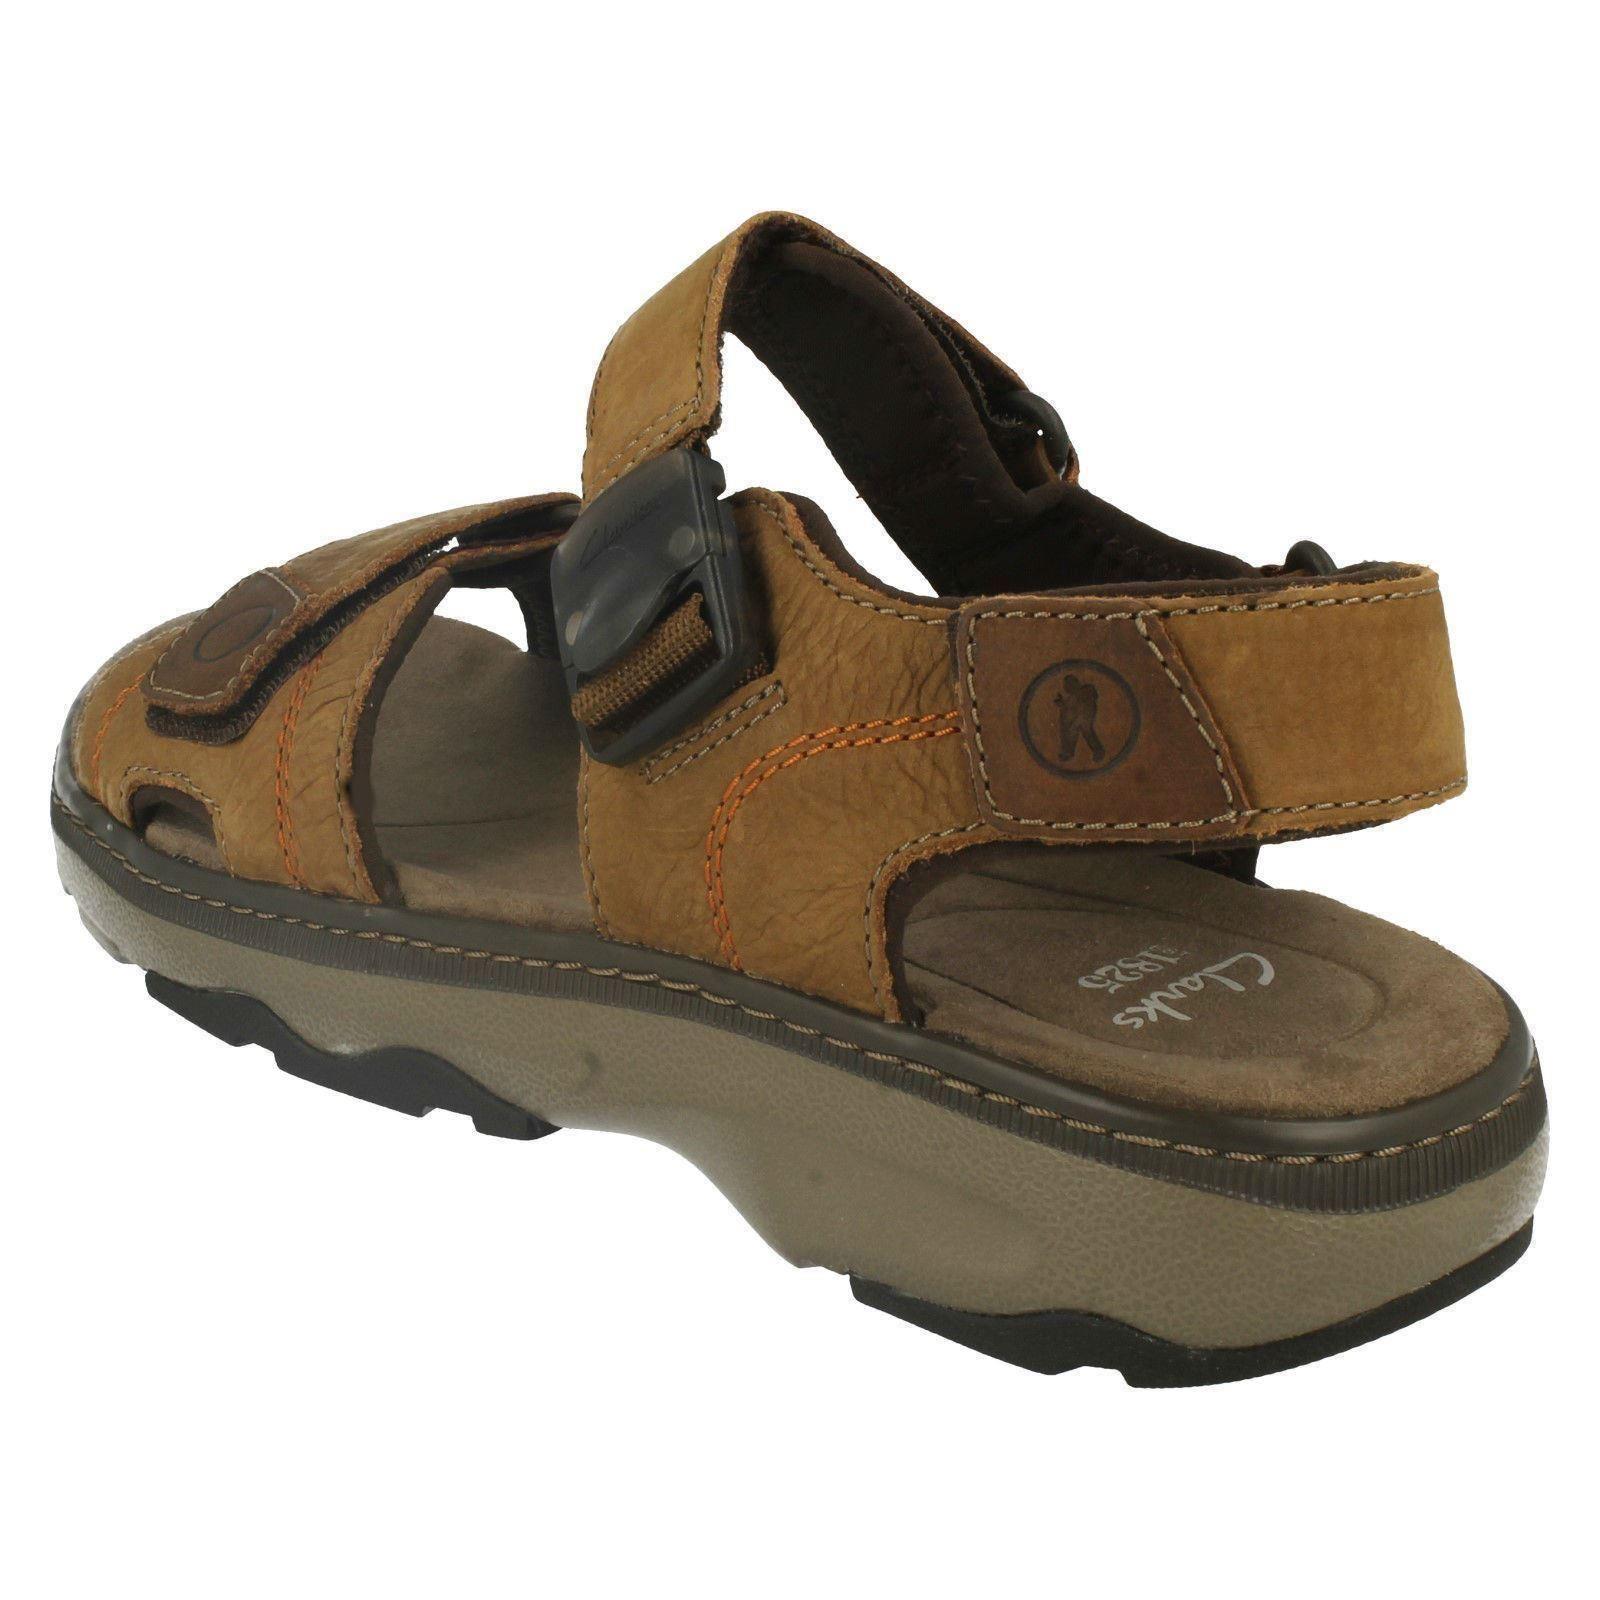 Clarks Mens Riptape Shoe